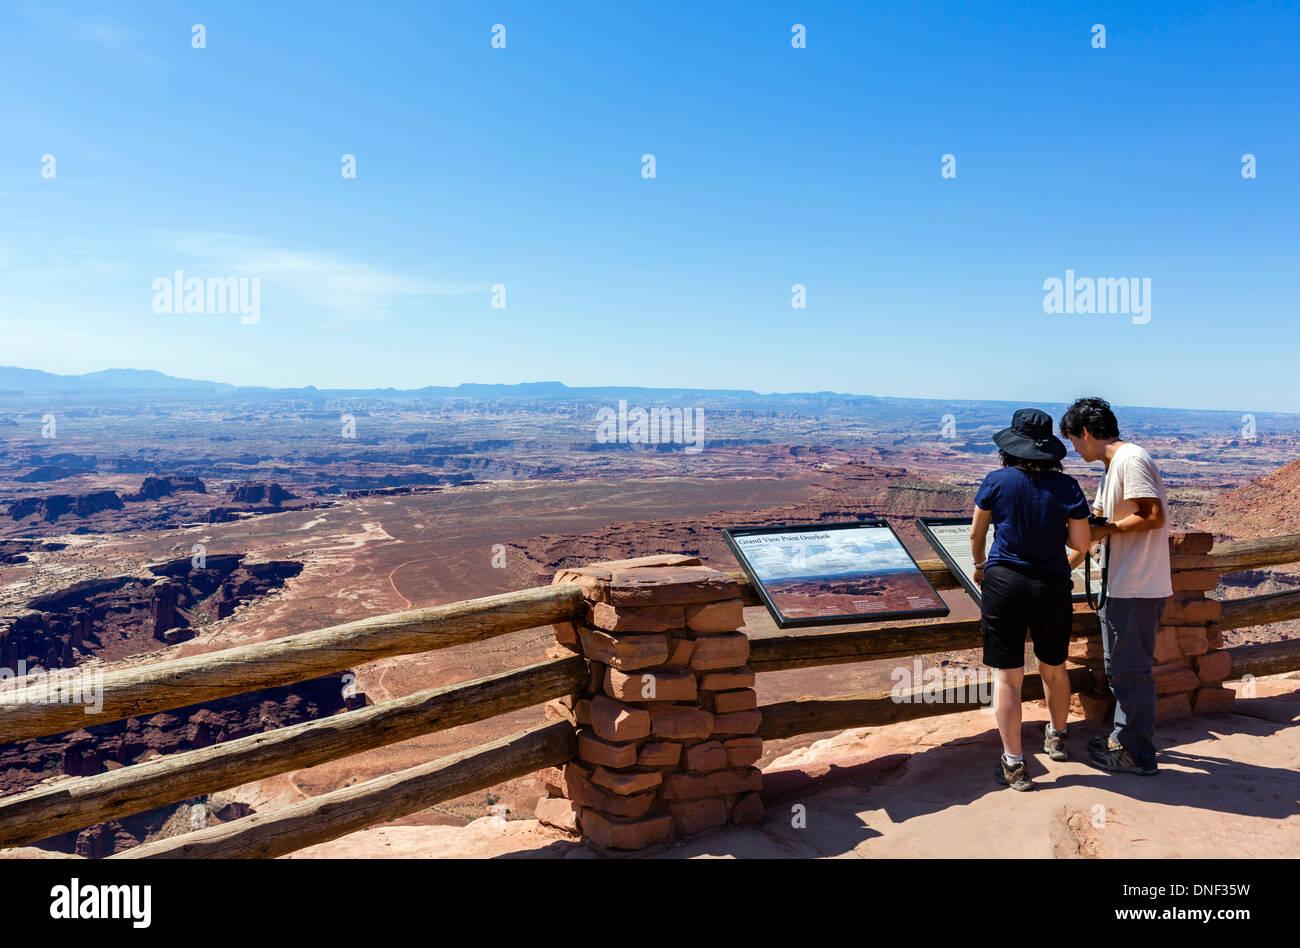 Touristen im Grand View Point übersehen, Insel im Himmel, Canyonlands National Park, Utah, USA Stockbild